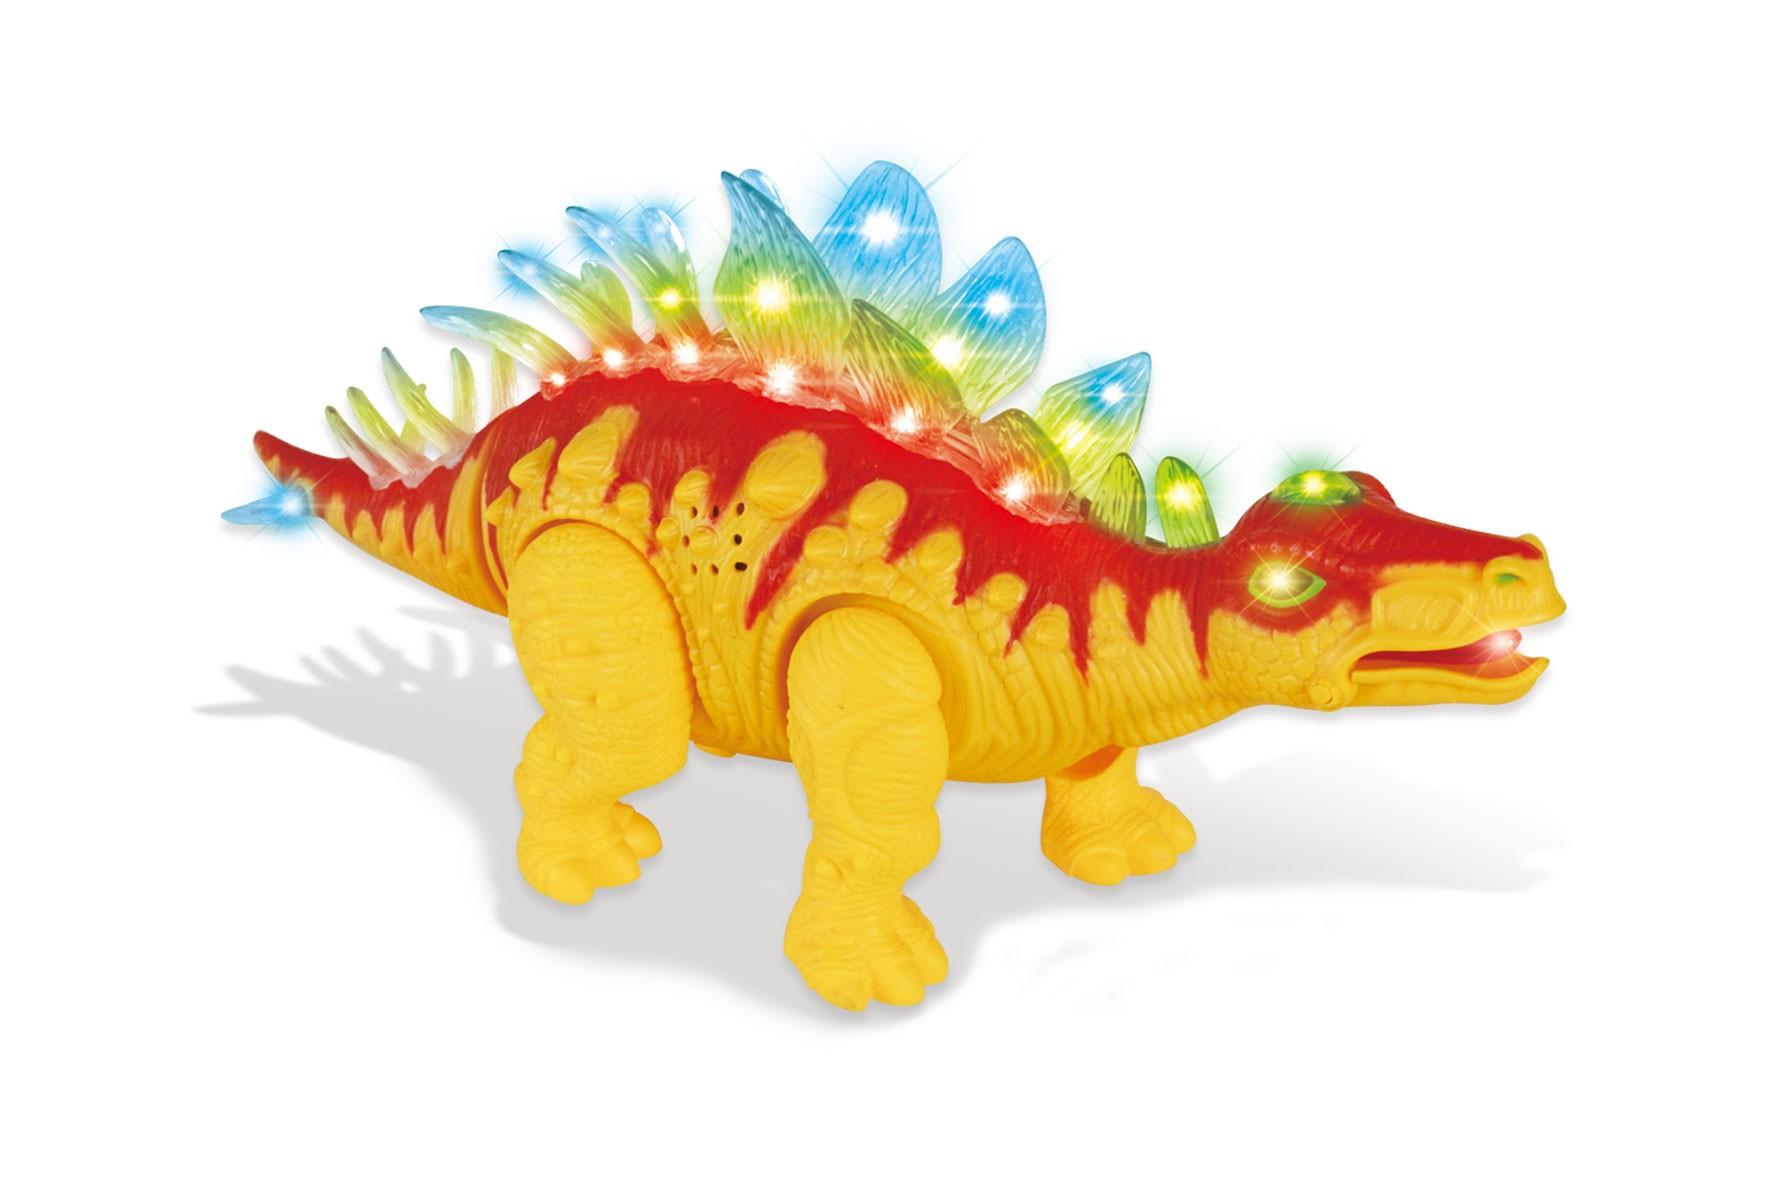 Walking Stegosaurus with Flashing And Sounds Dinosaur Toys For Kids (Orange)